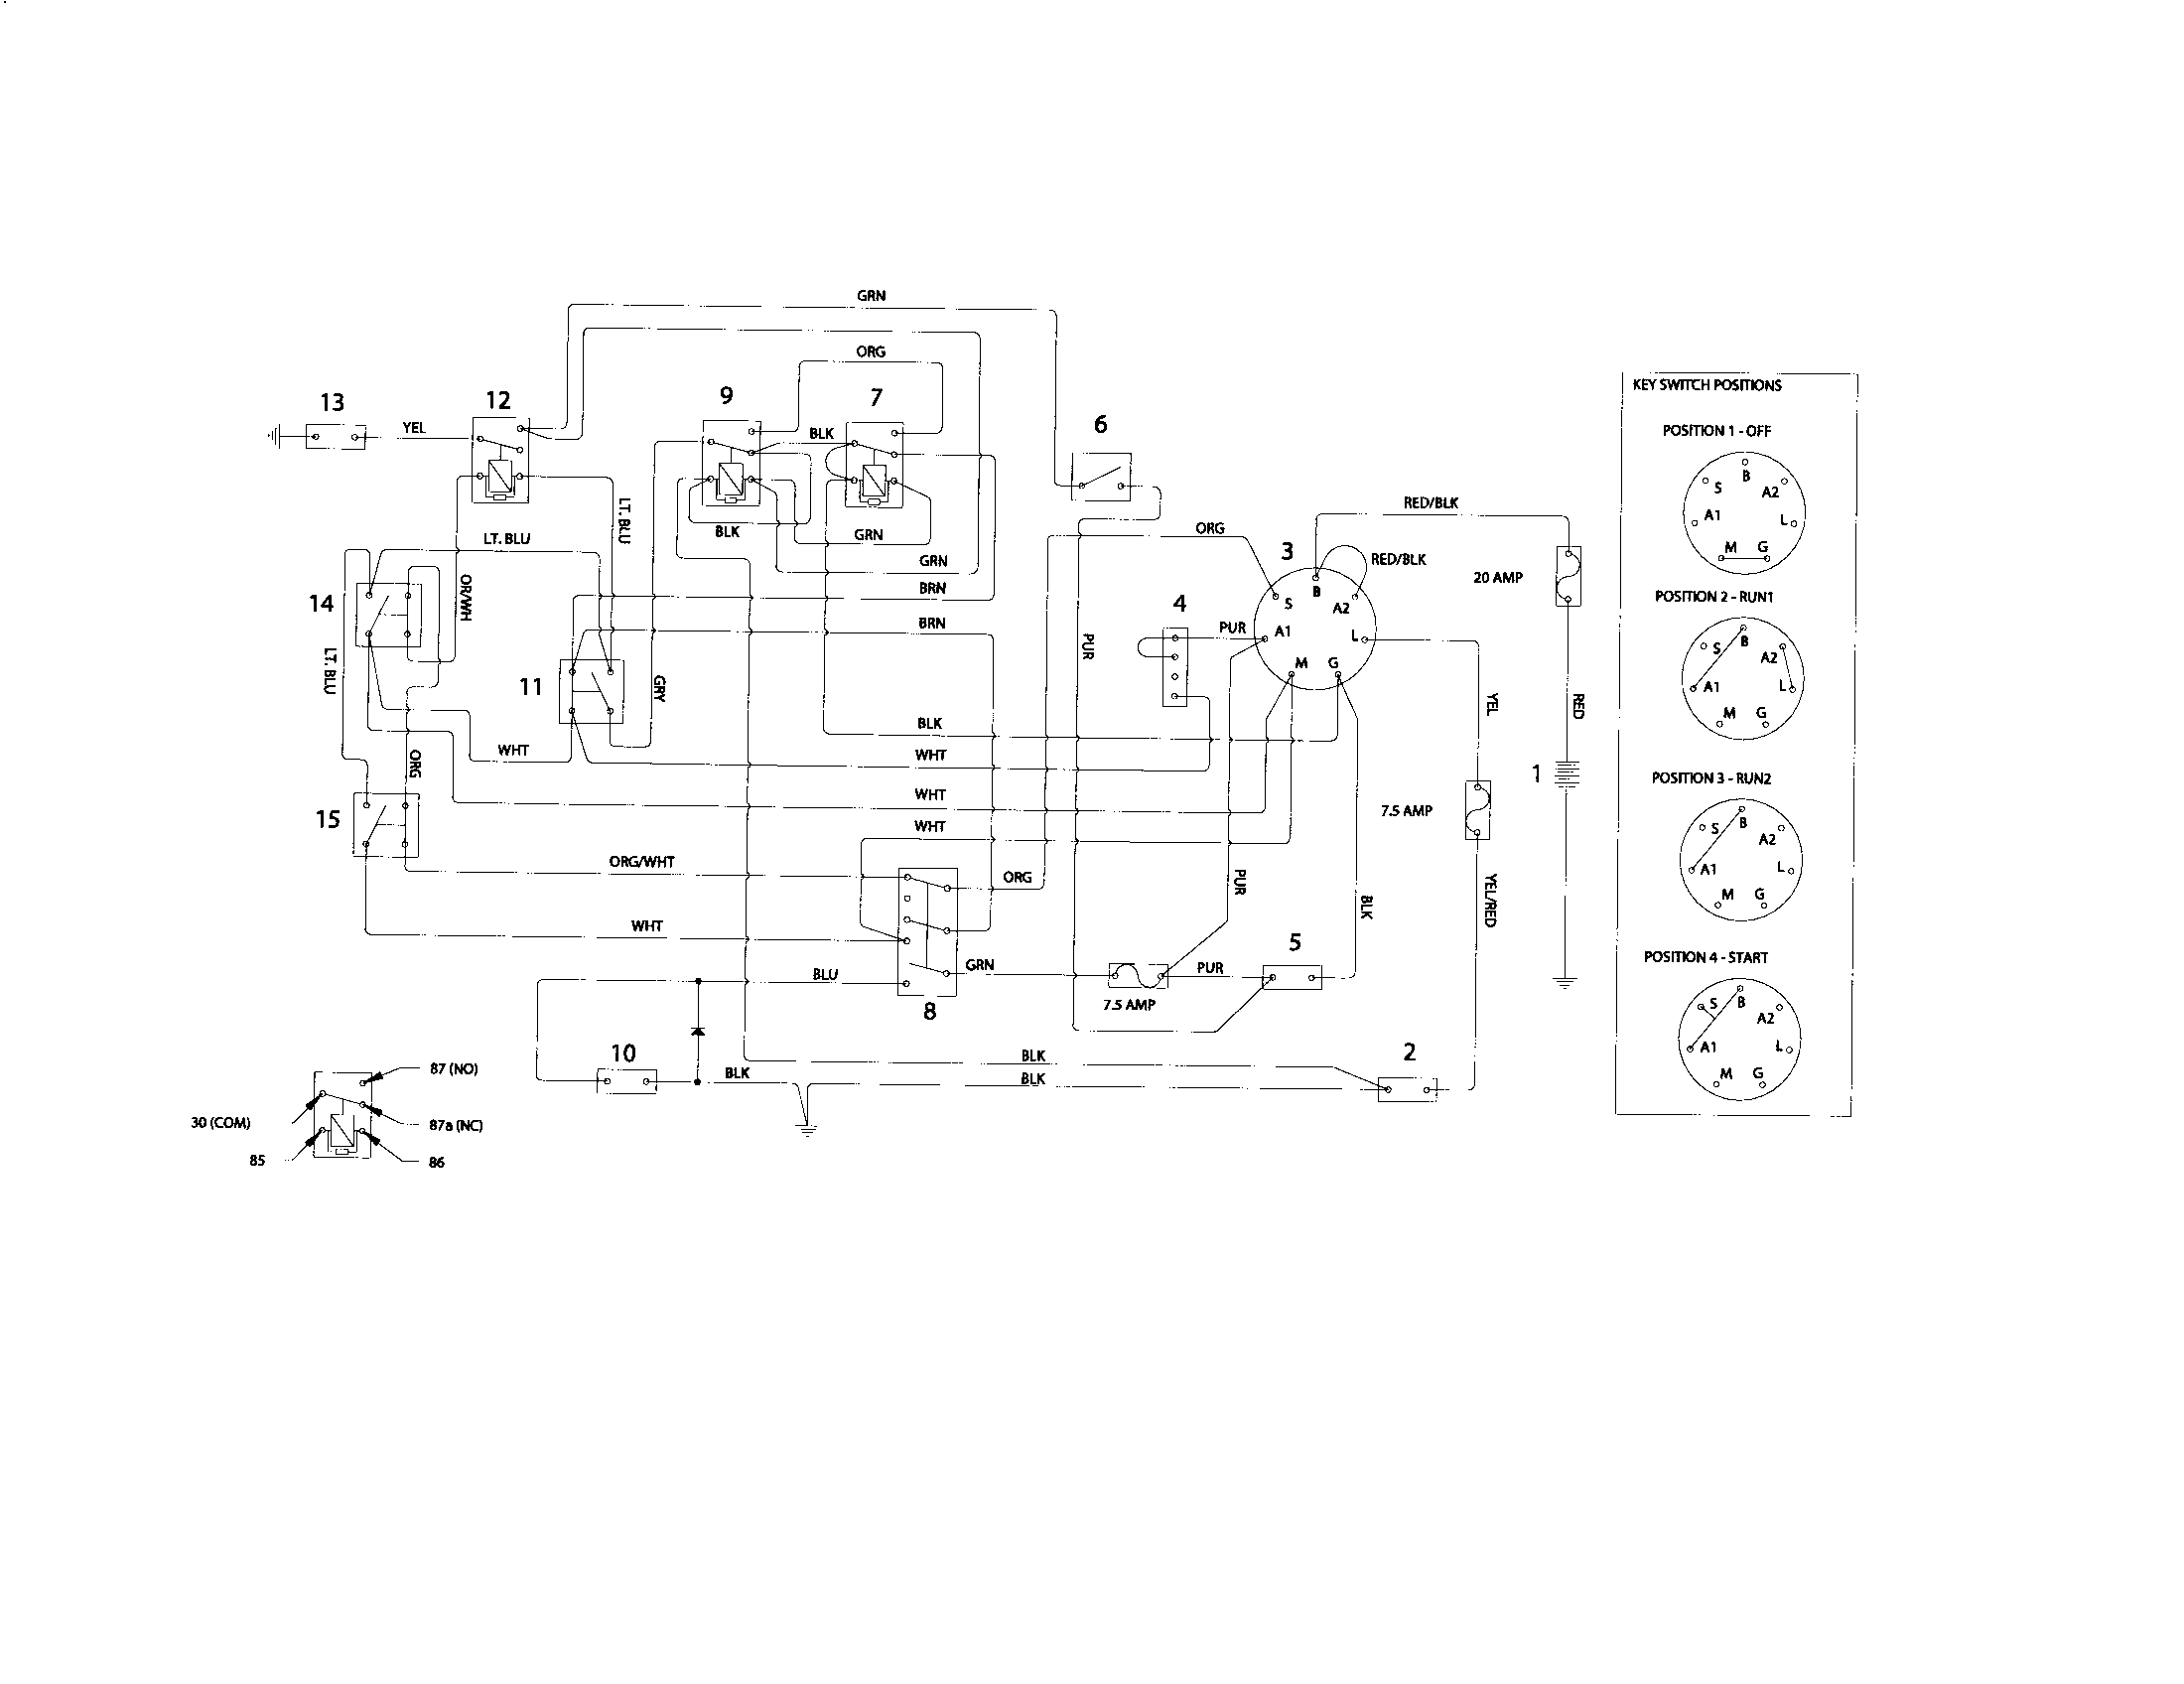 small resolution of looking for husqvarna model z5426 968999508 rear engine riding mowerhusqvarna z5426 968999508 schematic diagram diagram